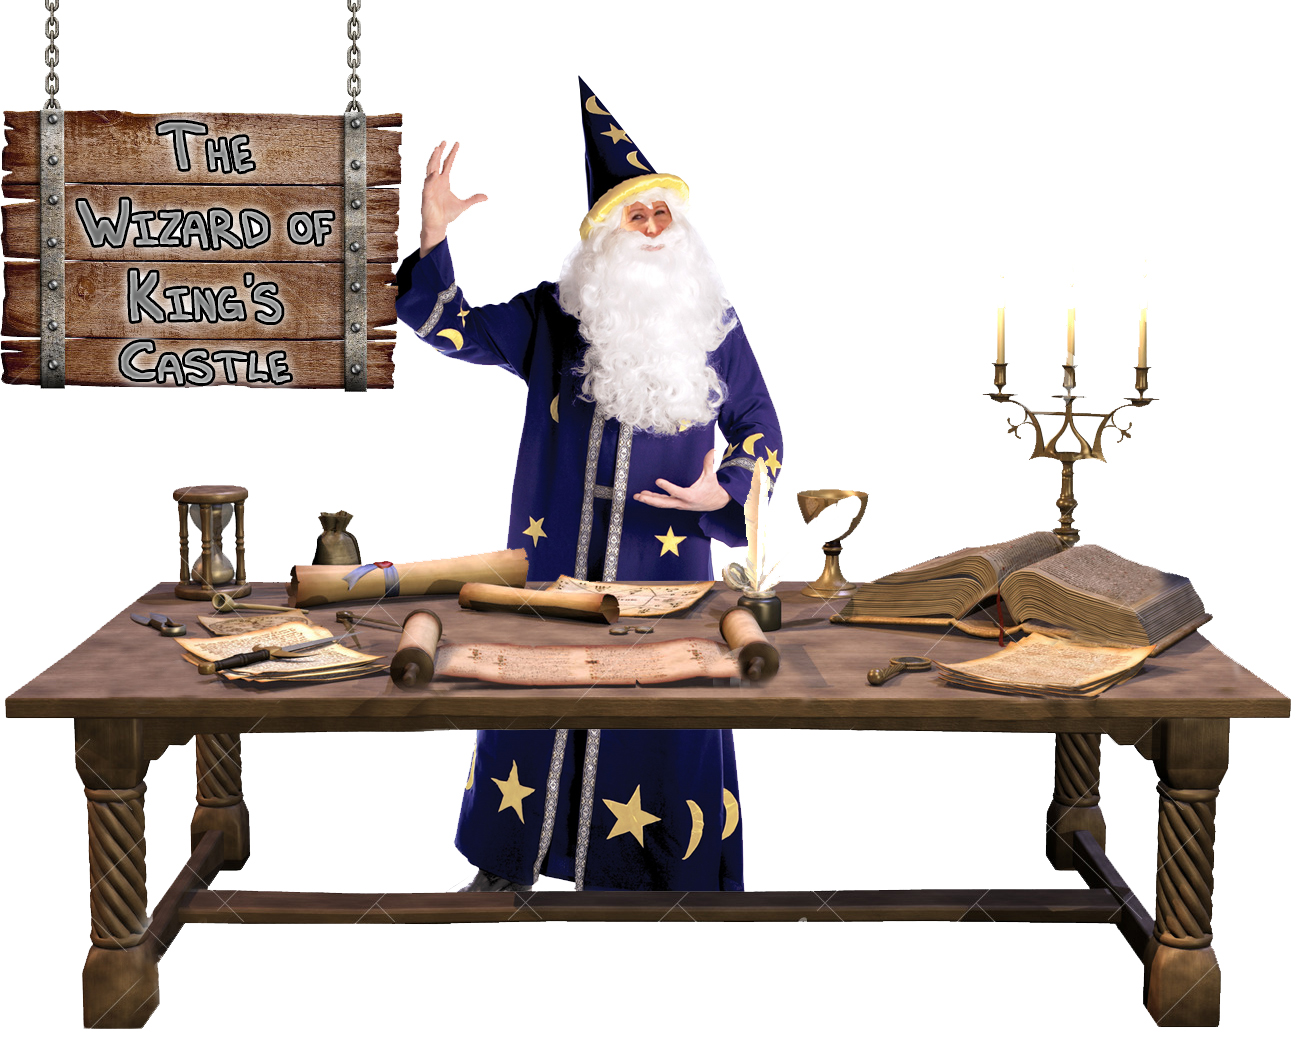 the Wizard of Kings Casle.jpg